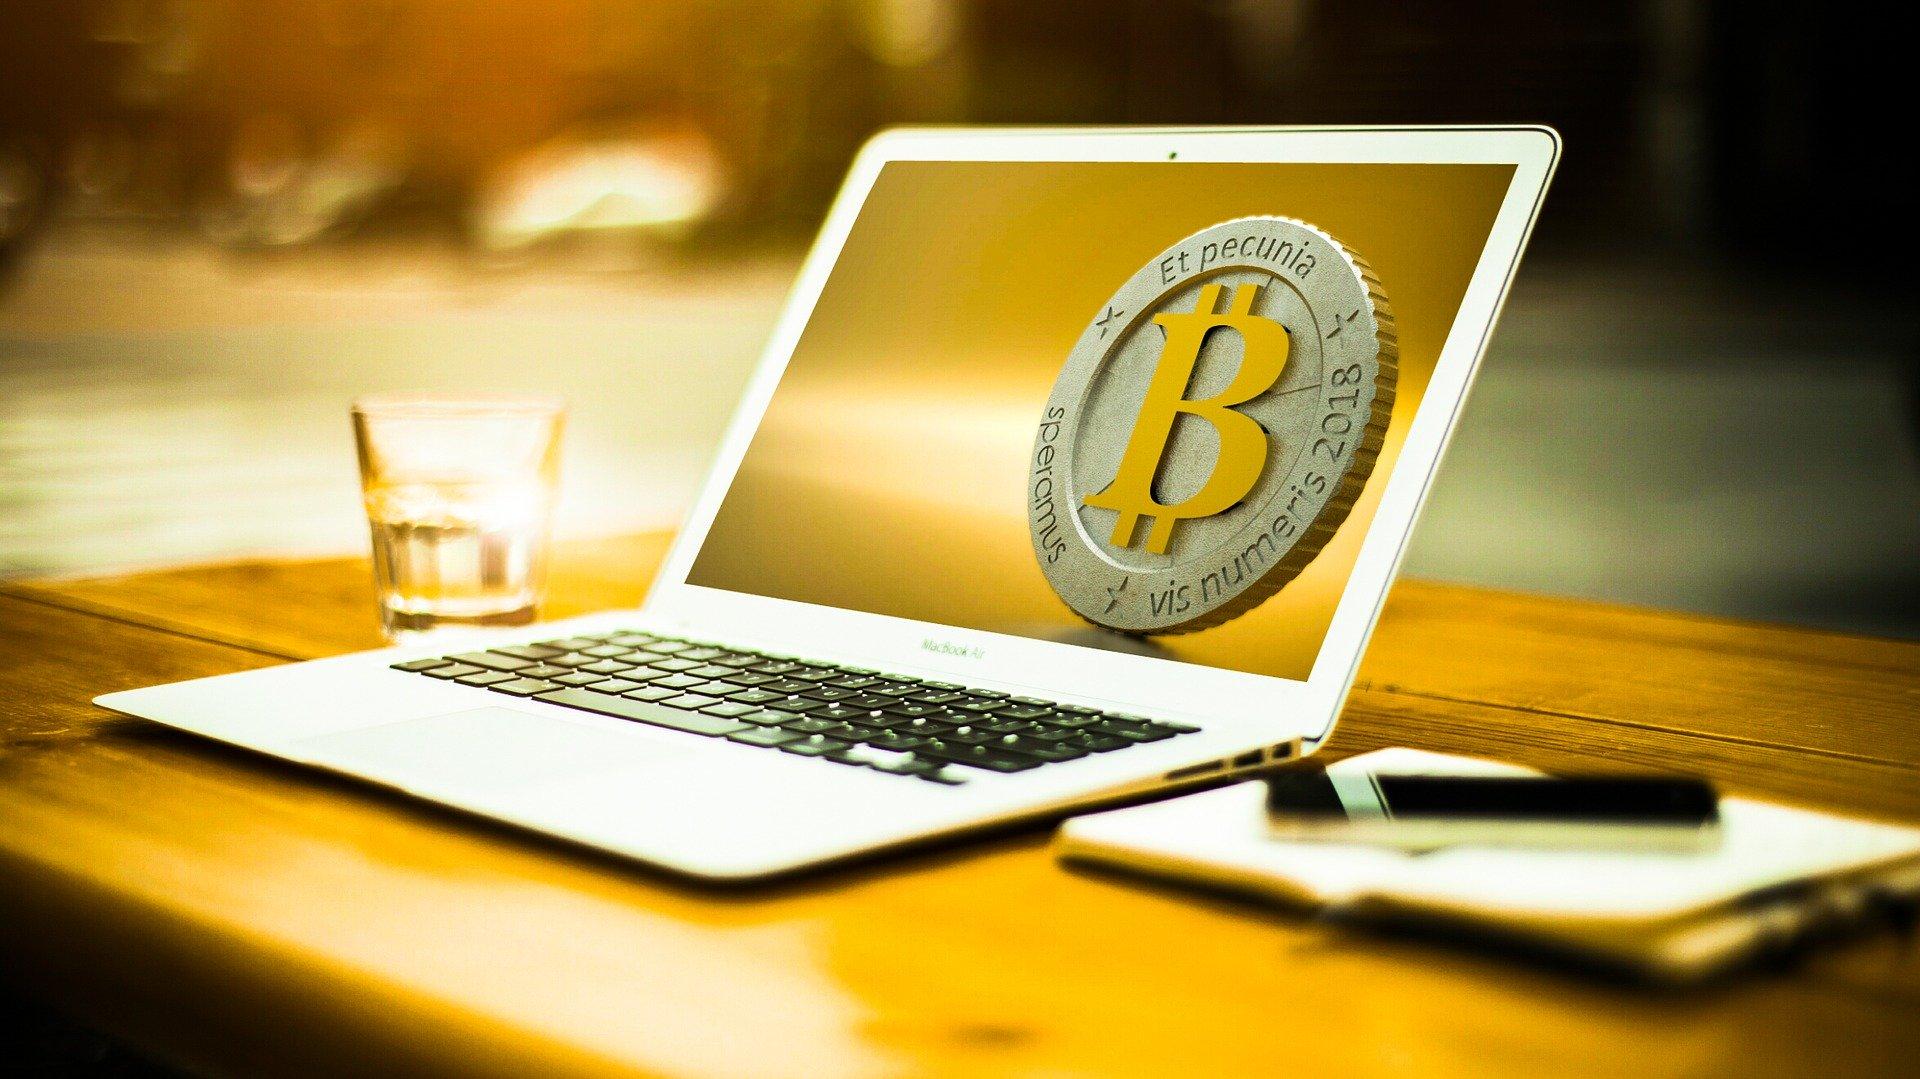 Blockkettentechnologie bei Bitcoin Era